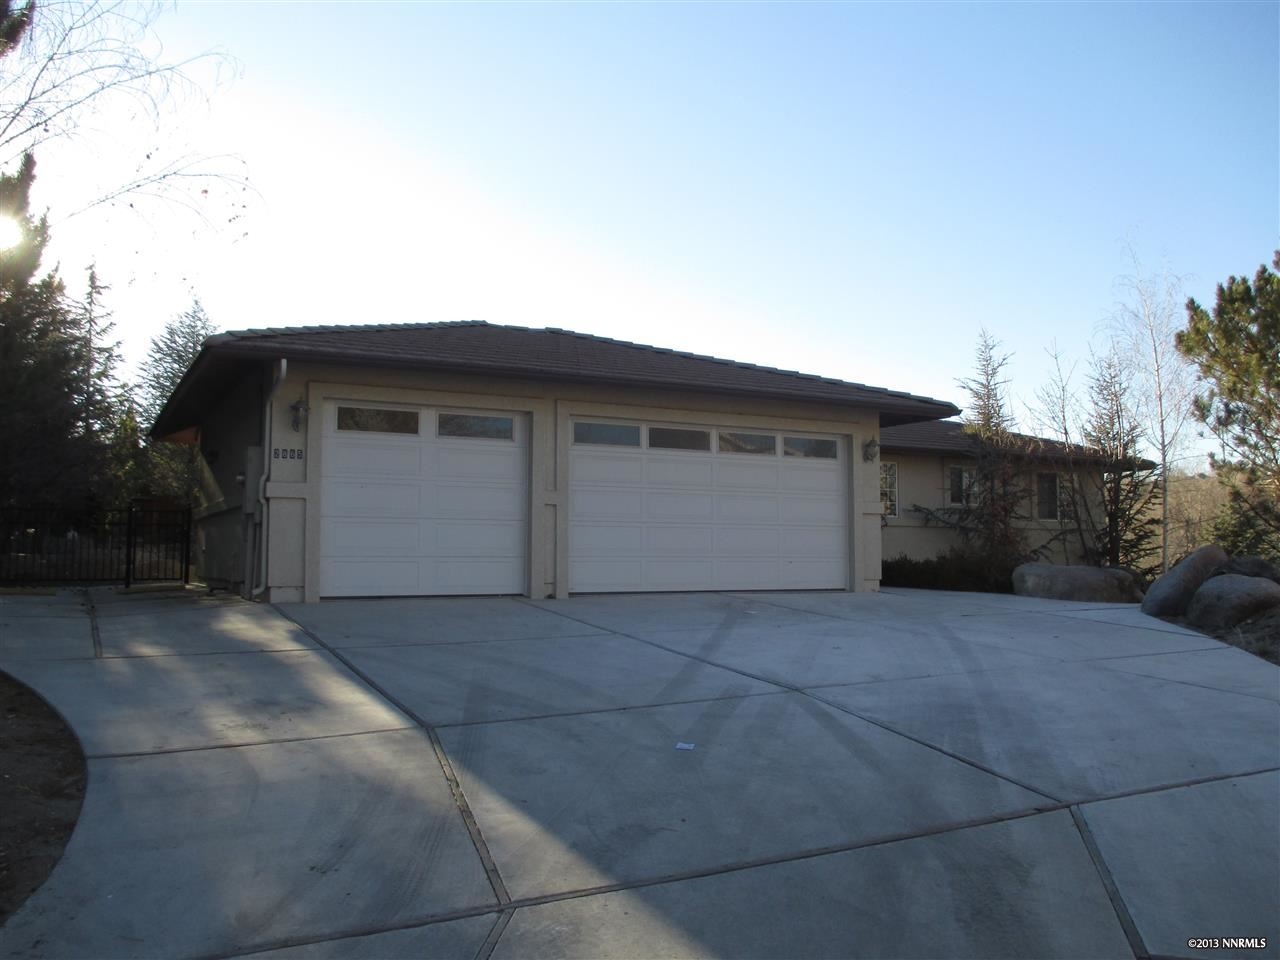 2865 W Pinenut Ct, Reno, NV